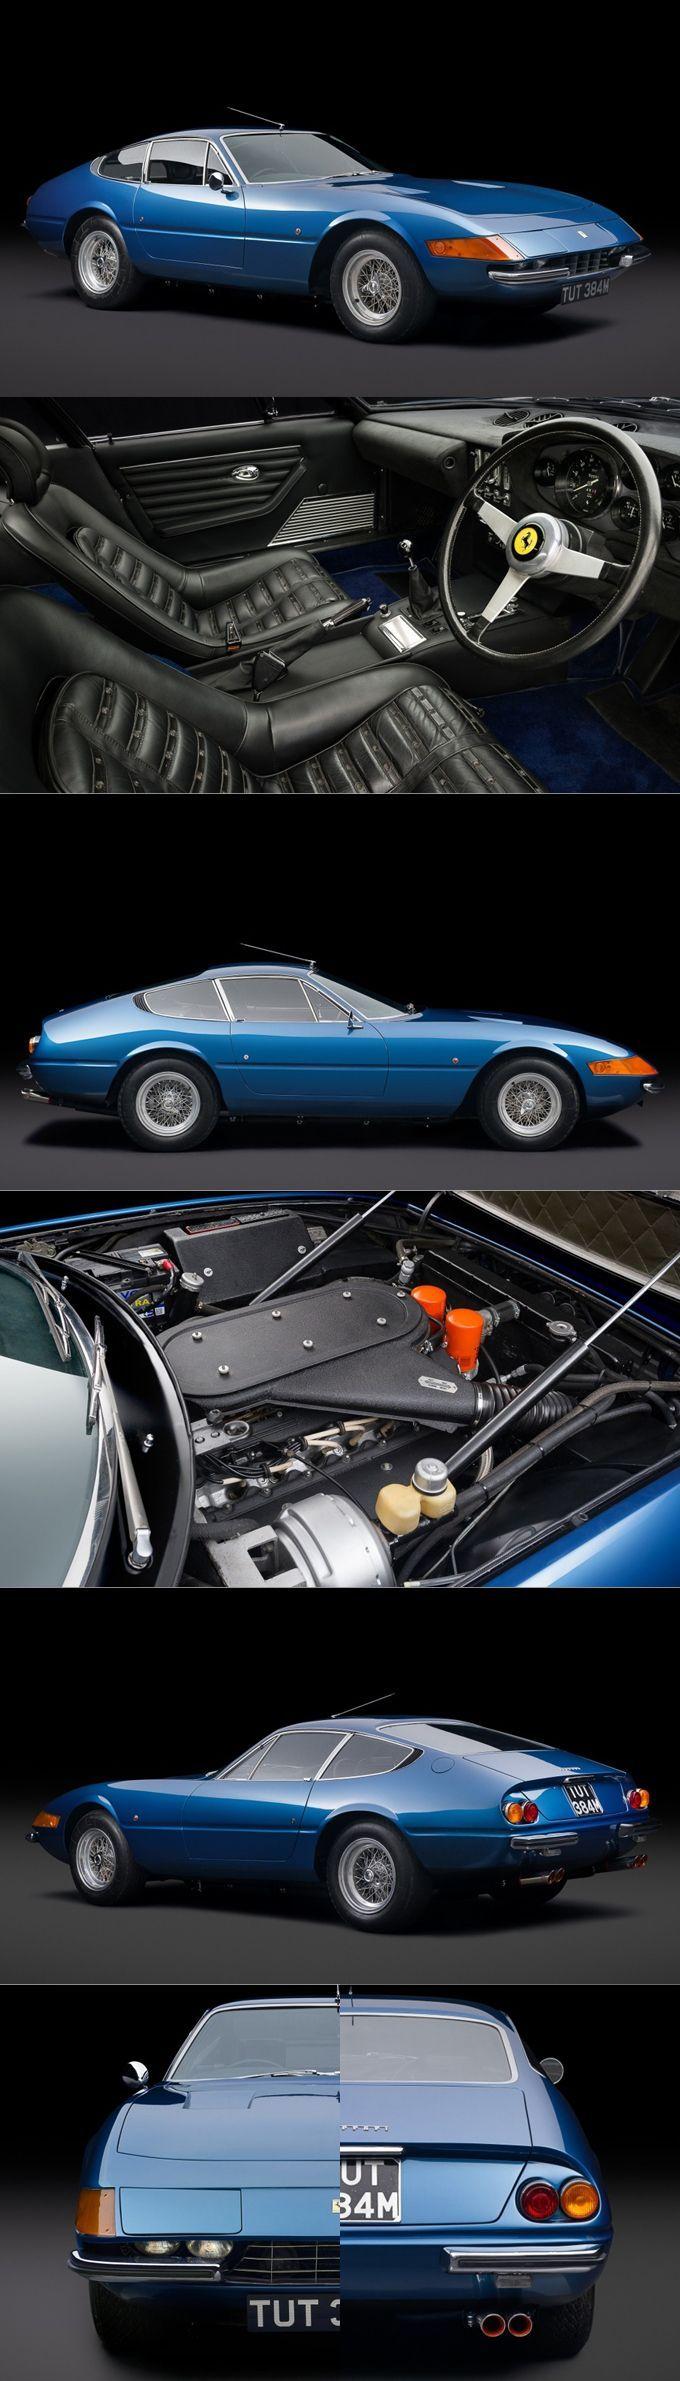 1973 #Ferrari 365 GTB/4 Daytona / 352hp V12 / Italy / blue